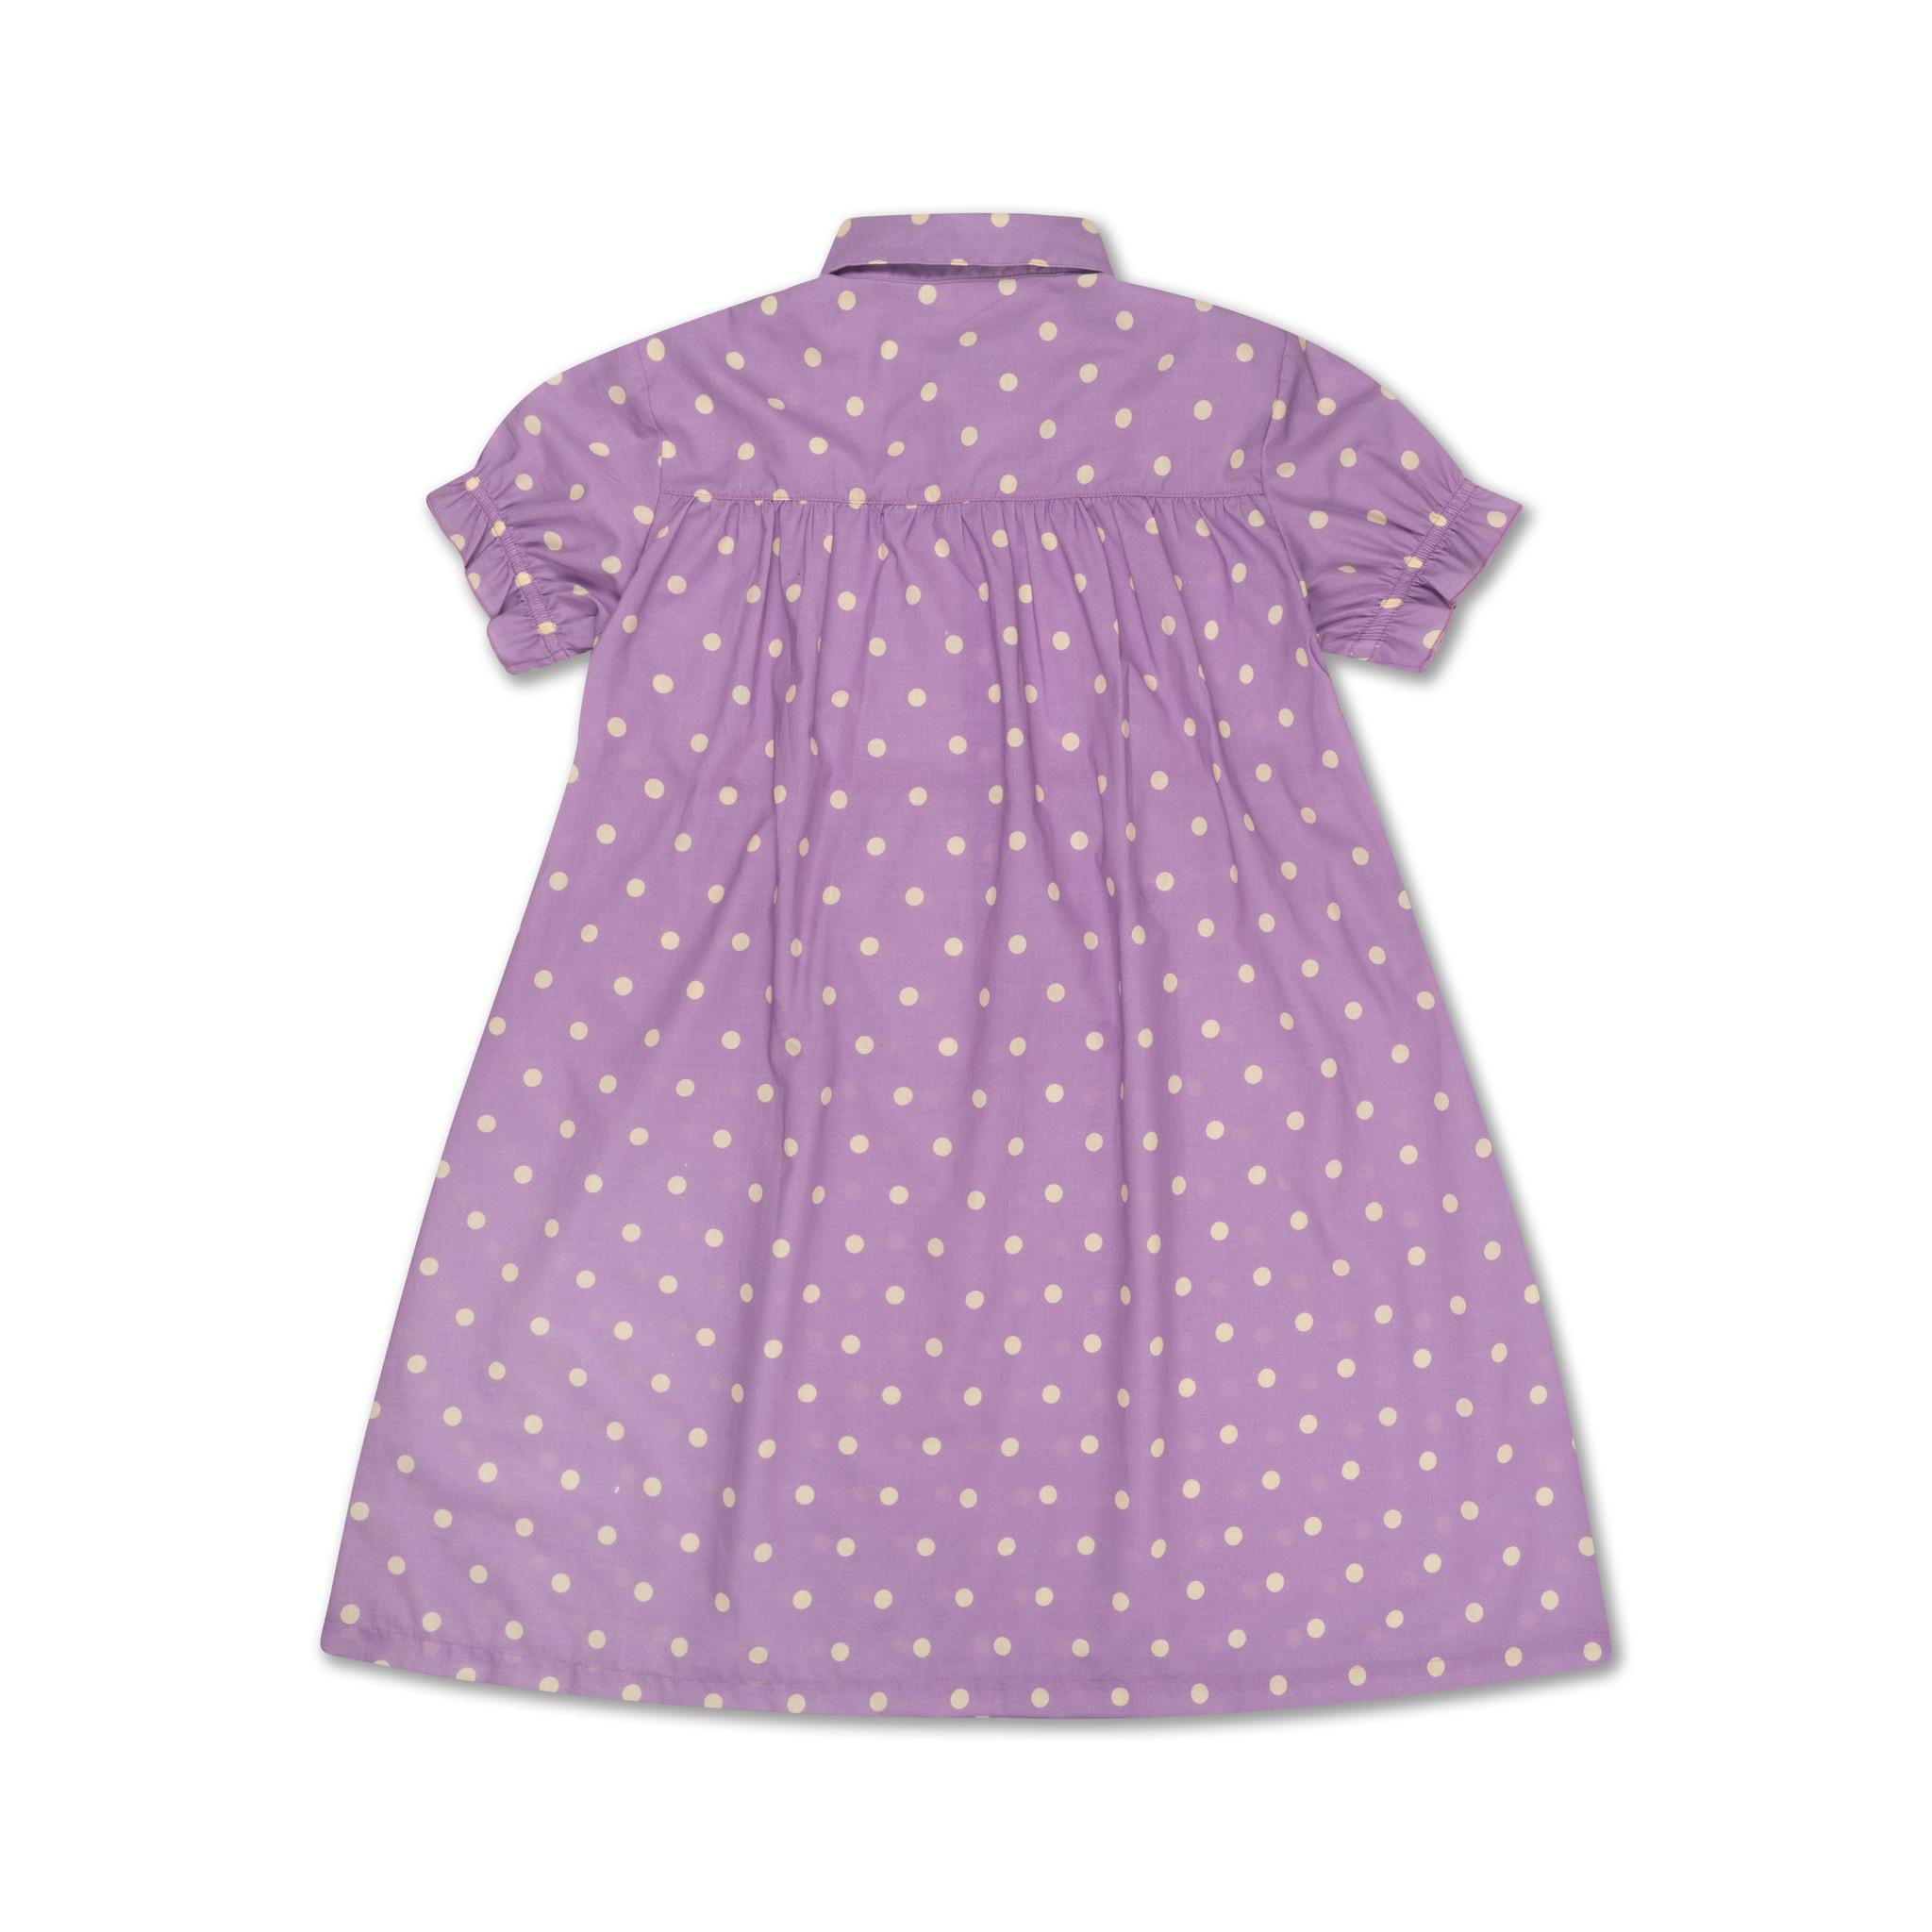 Dreamy dress - Greyish Lavender Polka Dot-3